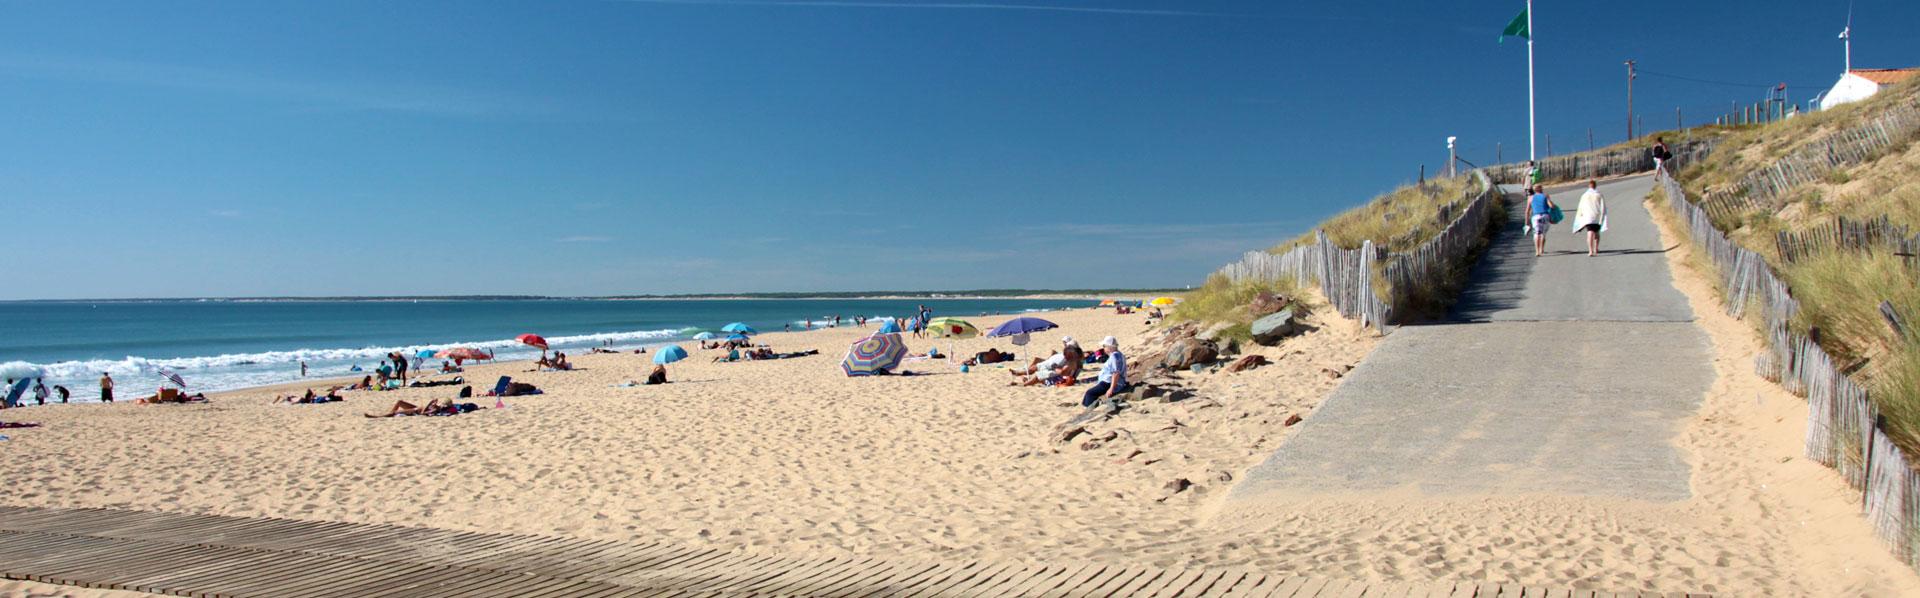 Vendee globe 2016 camping longeville sur mer vend e for Camping noirmoutier avec piscine toboggan